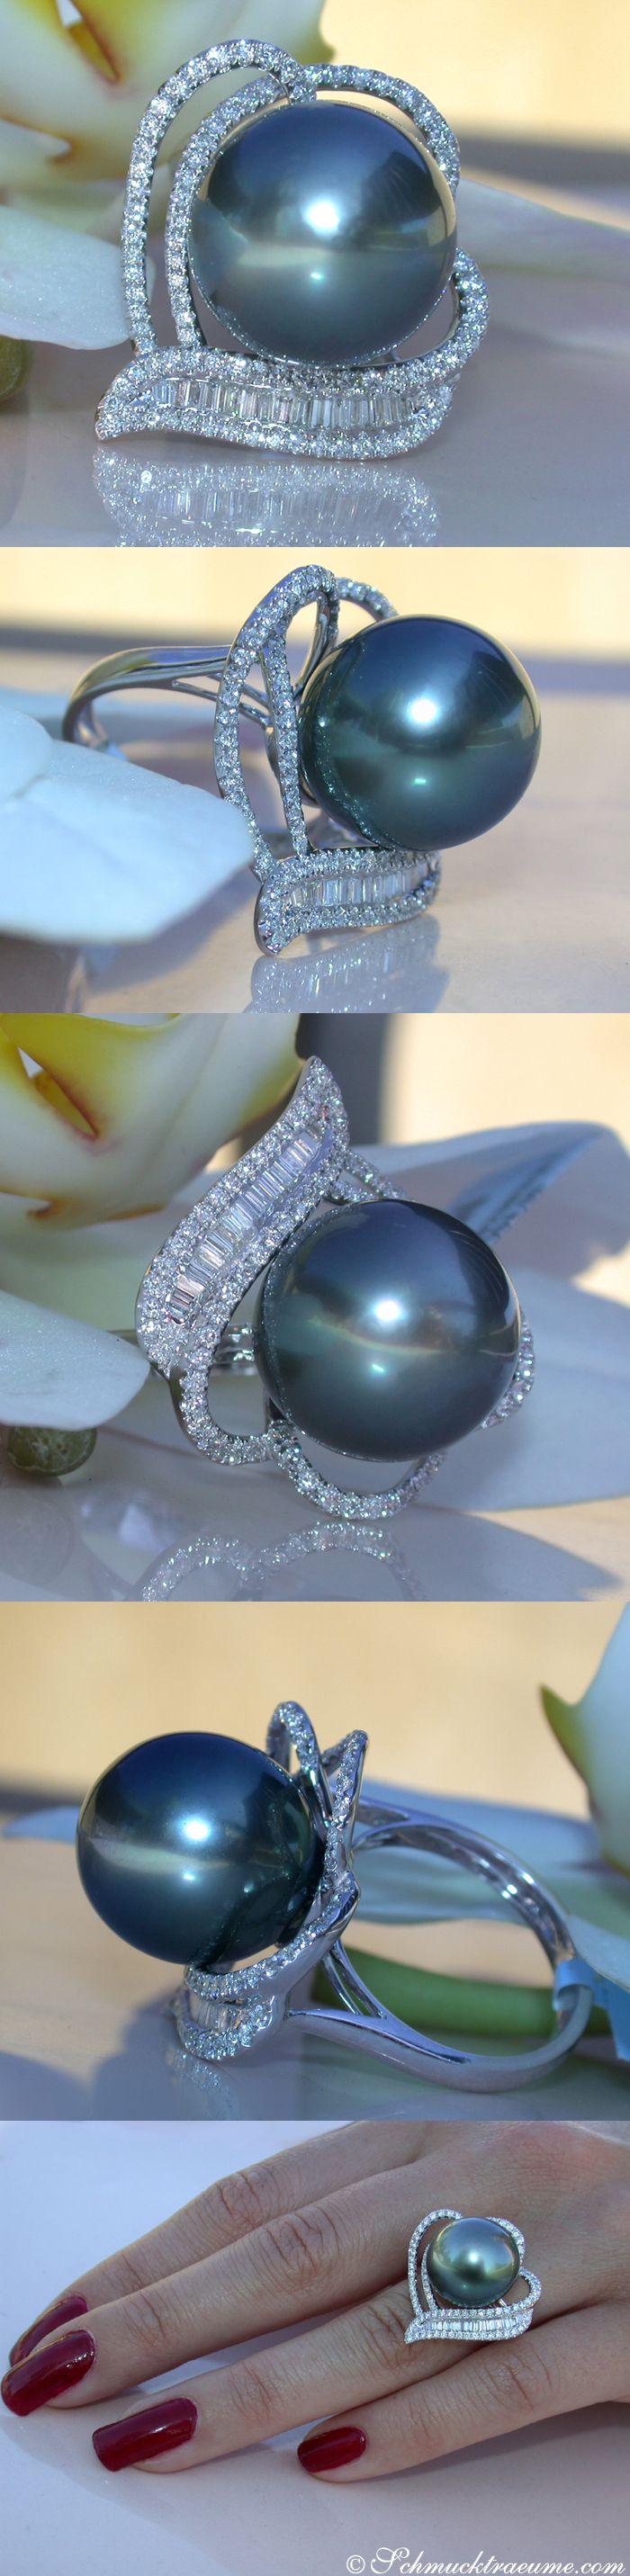 Pearl rings,pearl promise rings,mom rings,mother ring,real pearl ring,sterling…